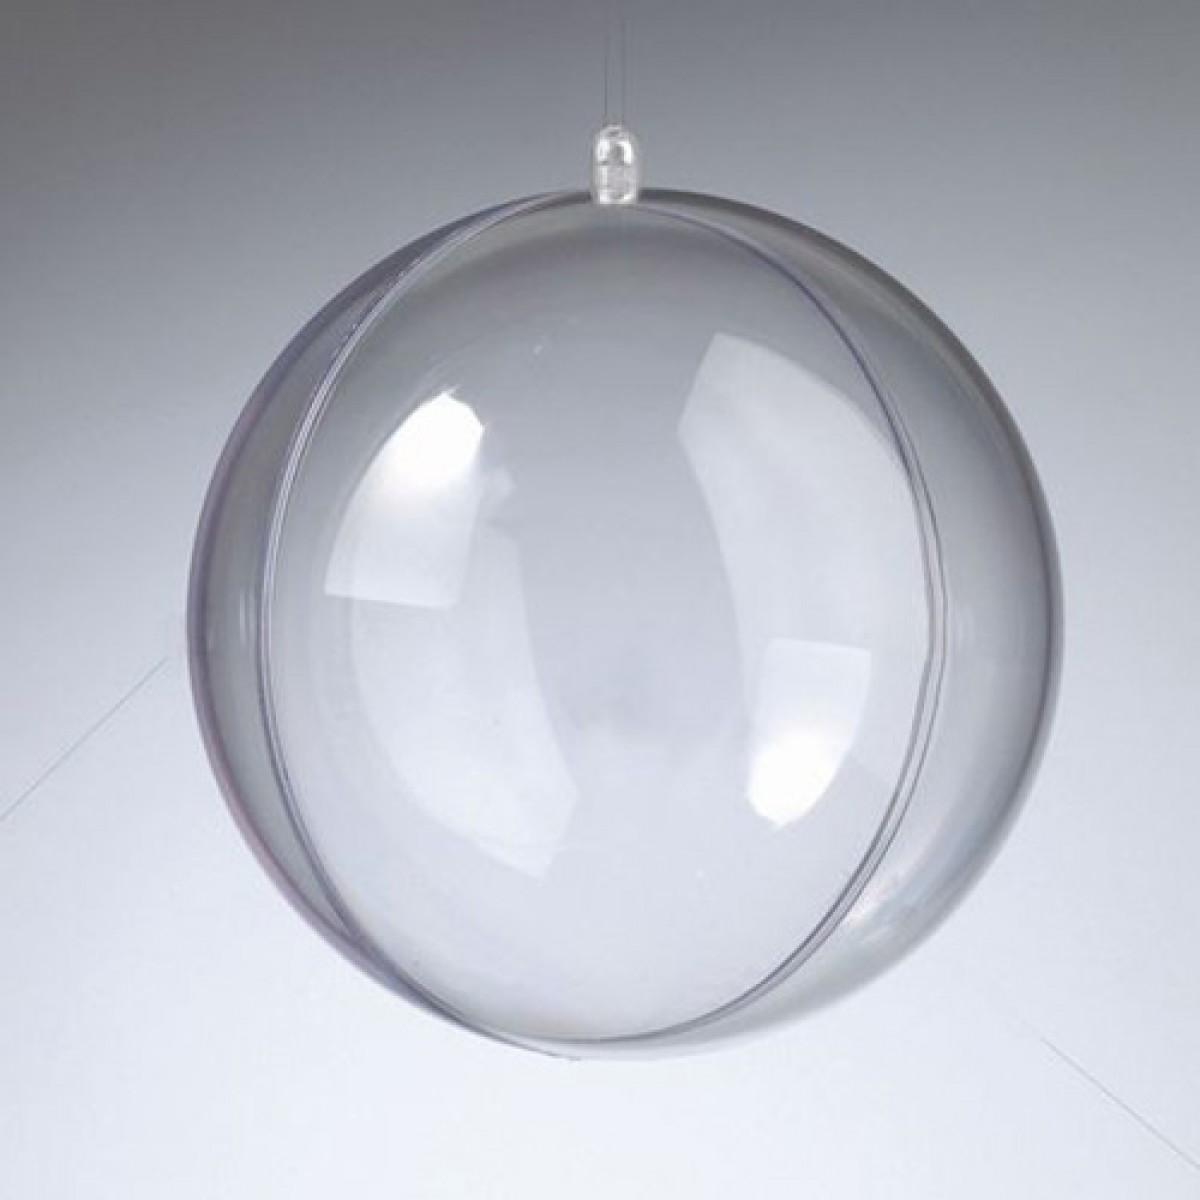 Efco Πλαστική Μπάλα Διάφανη 140mm Υλικά Χειροτεχνίας